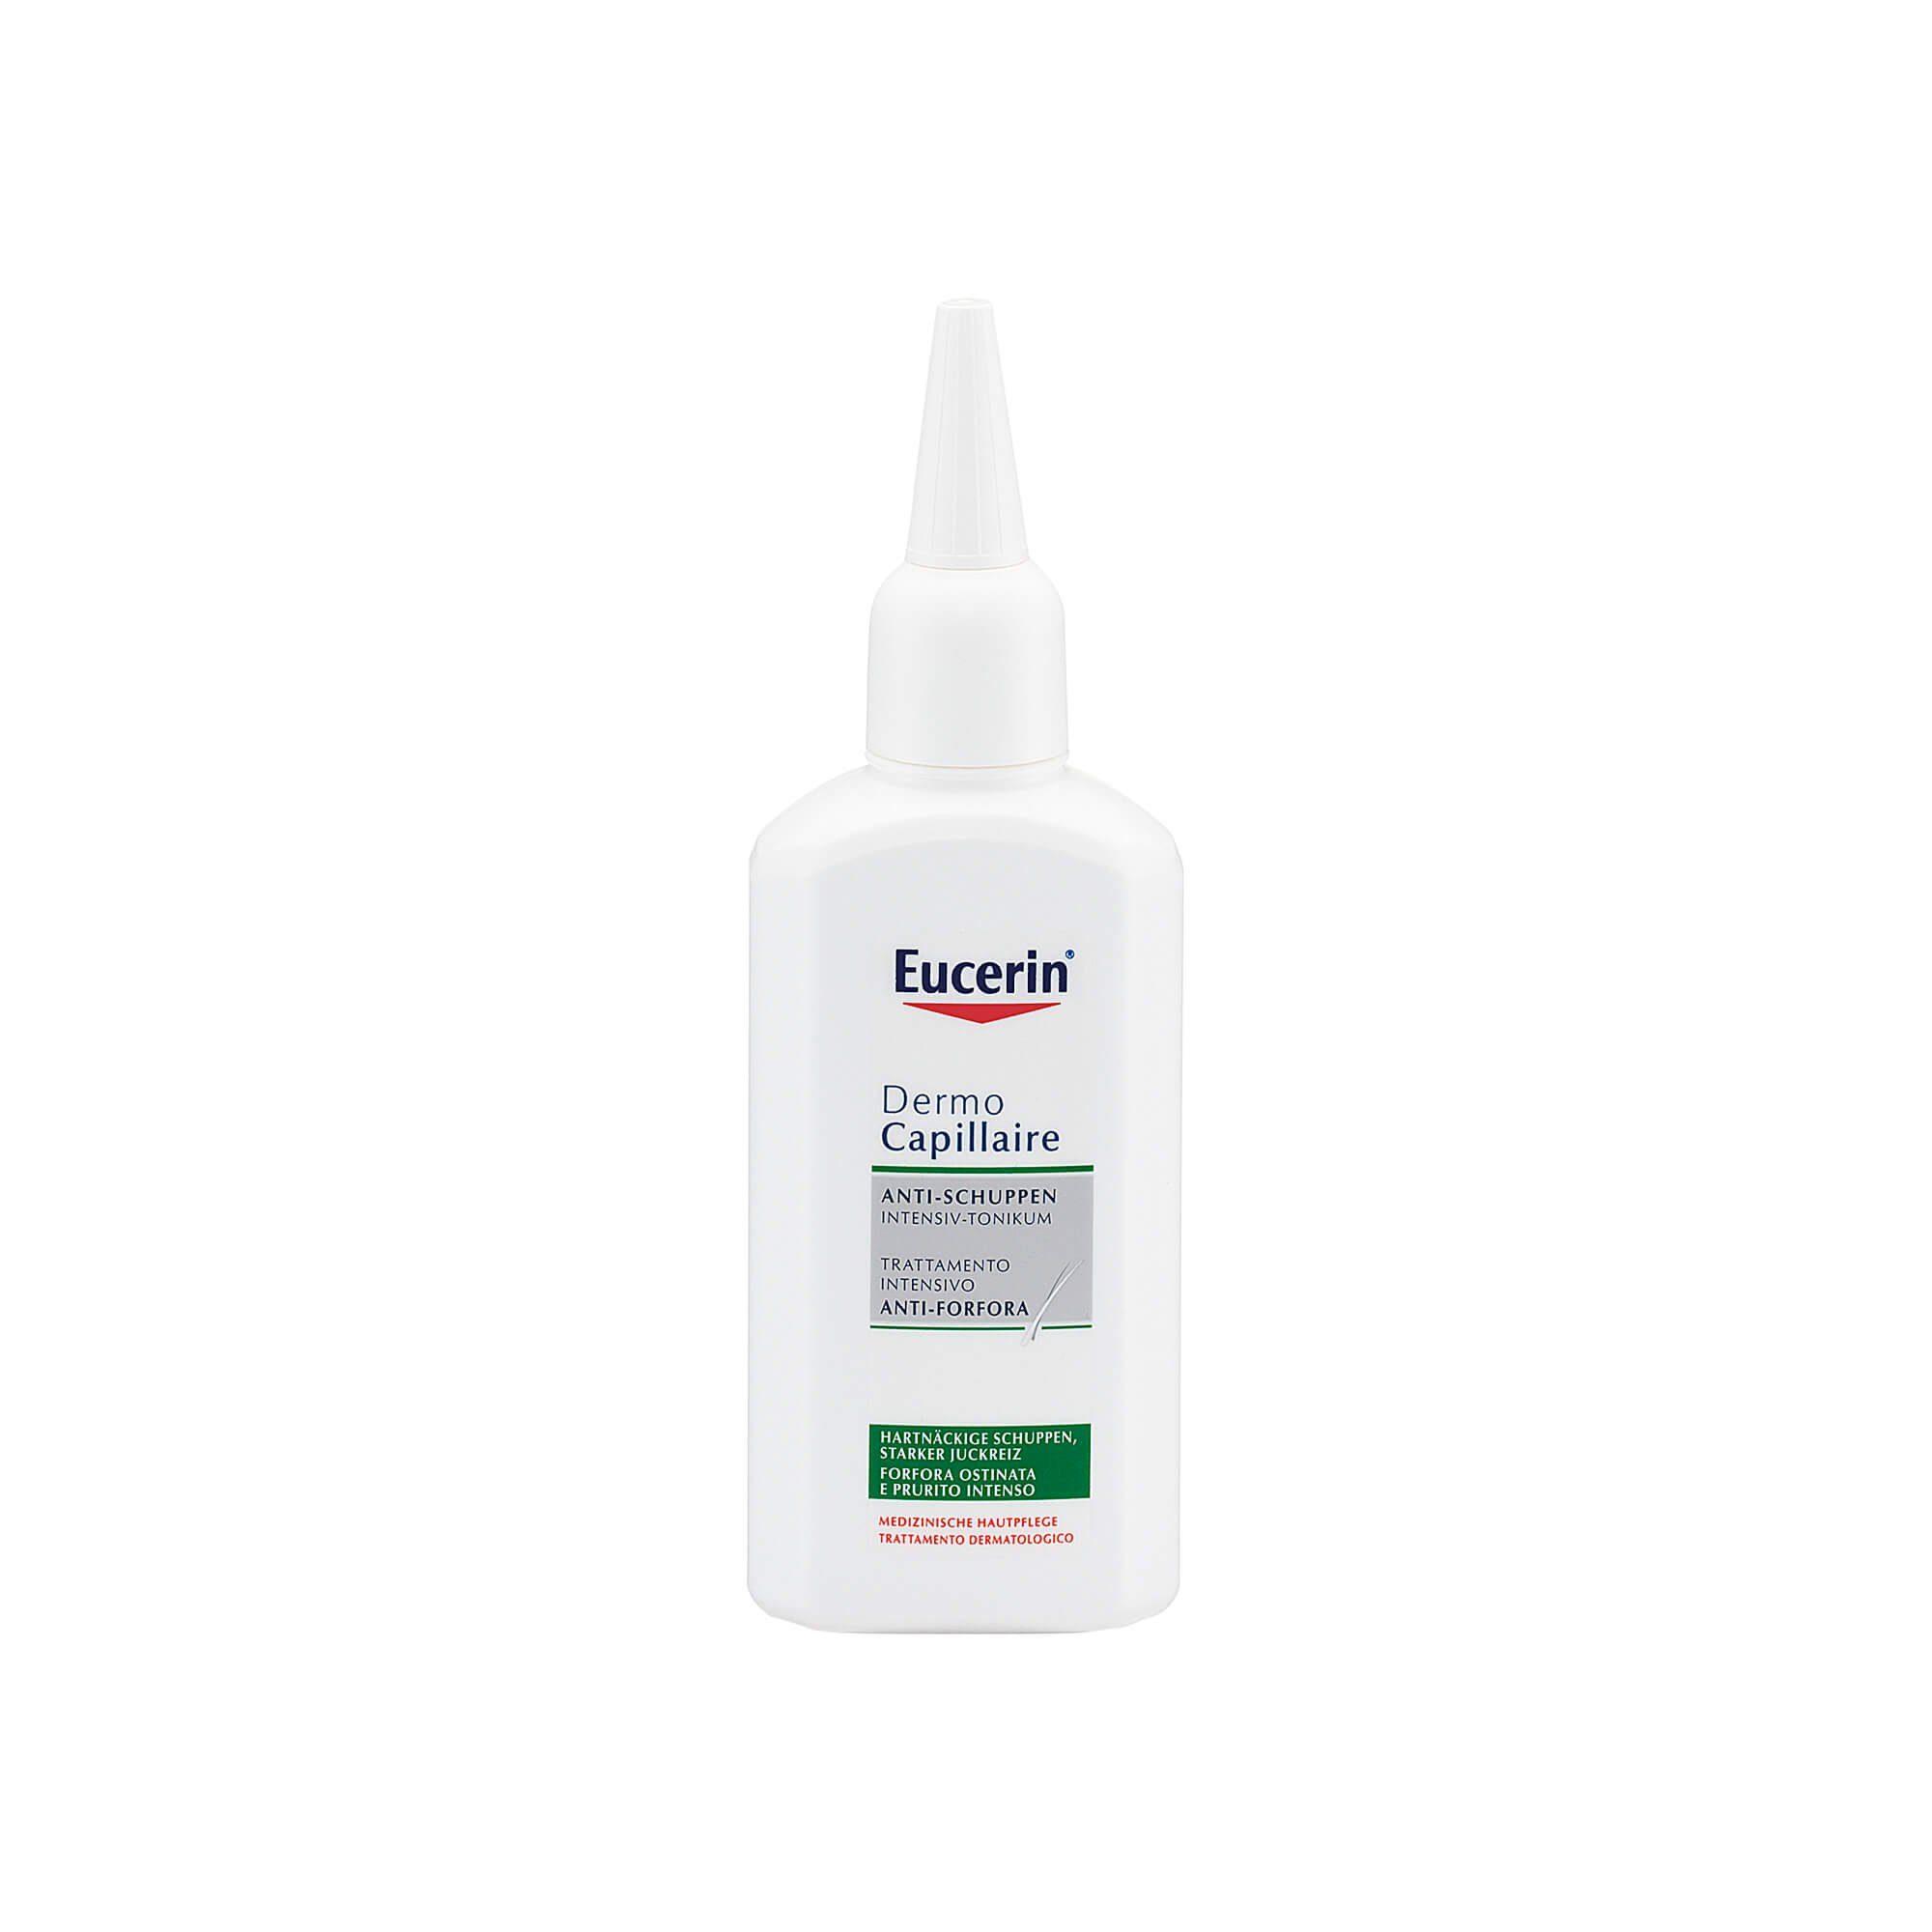 Eucerin DermoCapillaire Anti-Schuppen Intensiv-Tonikum , 100 ml